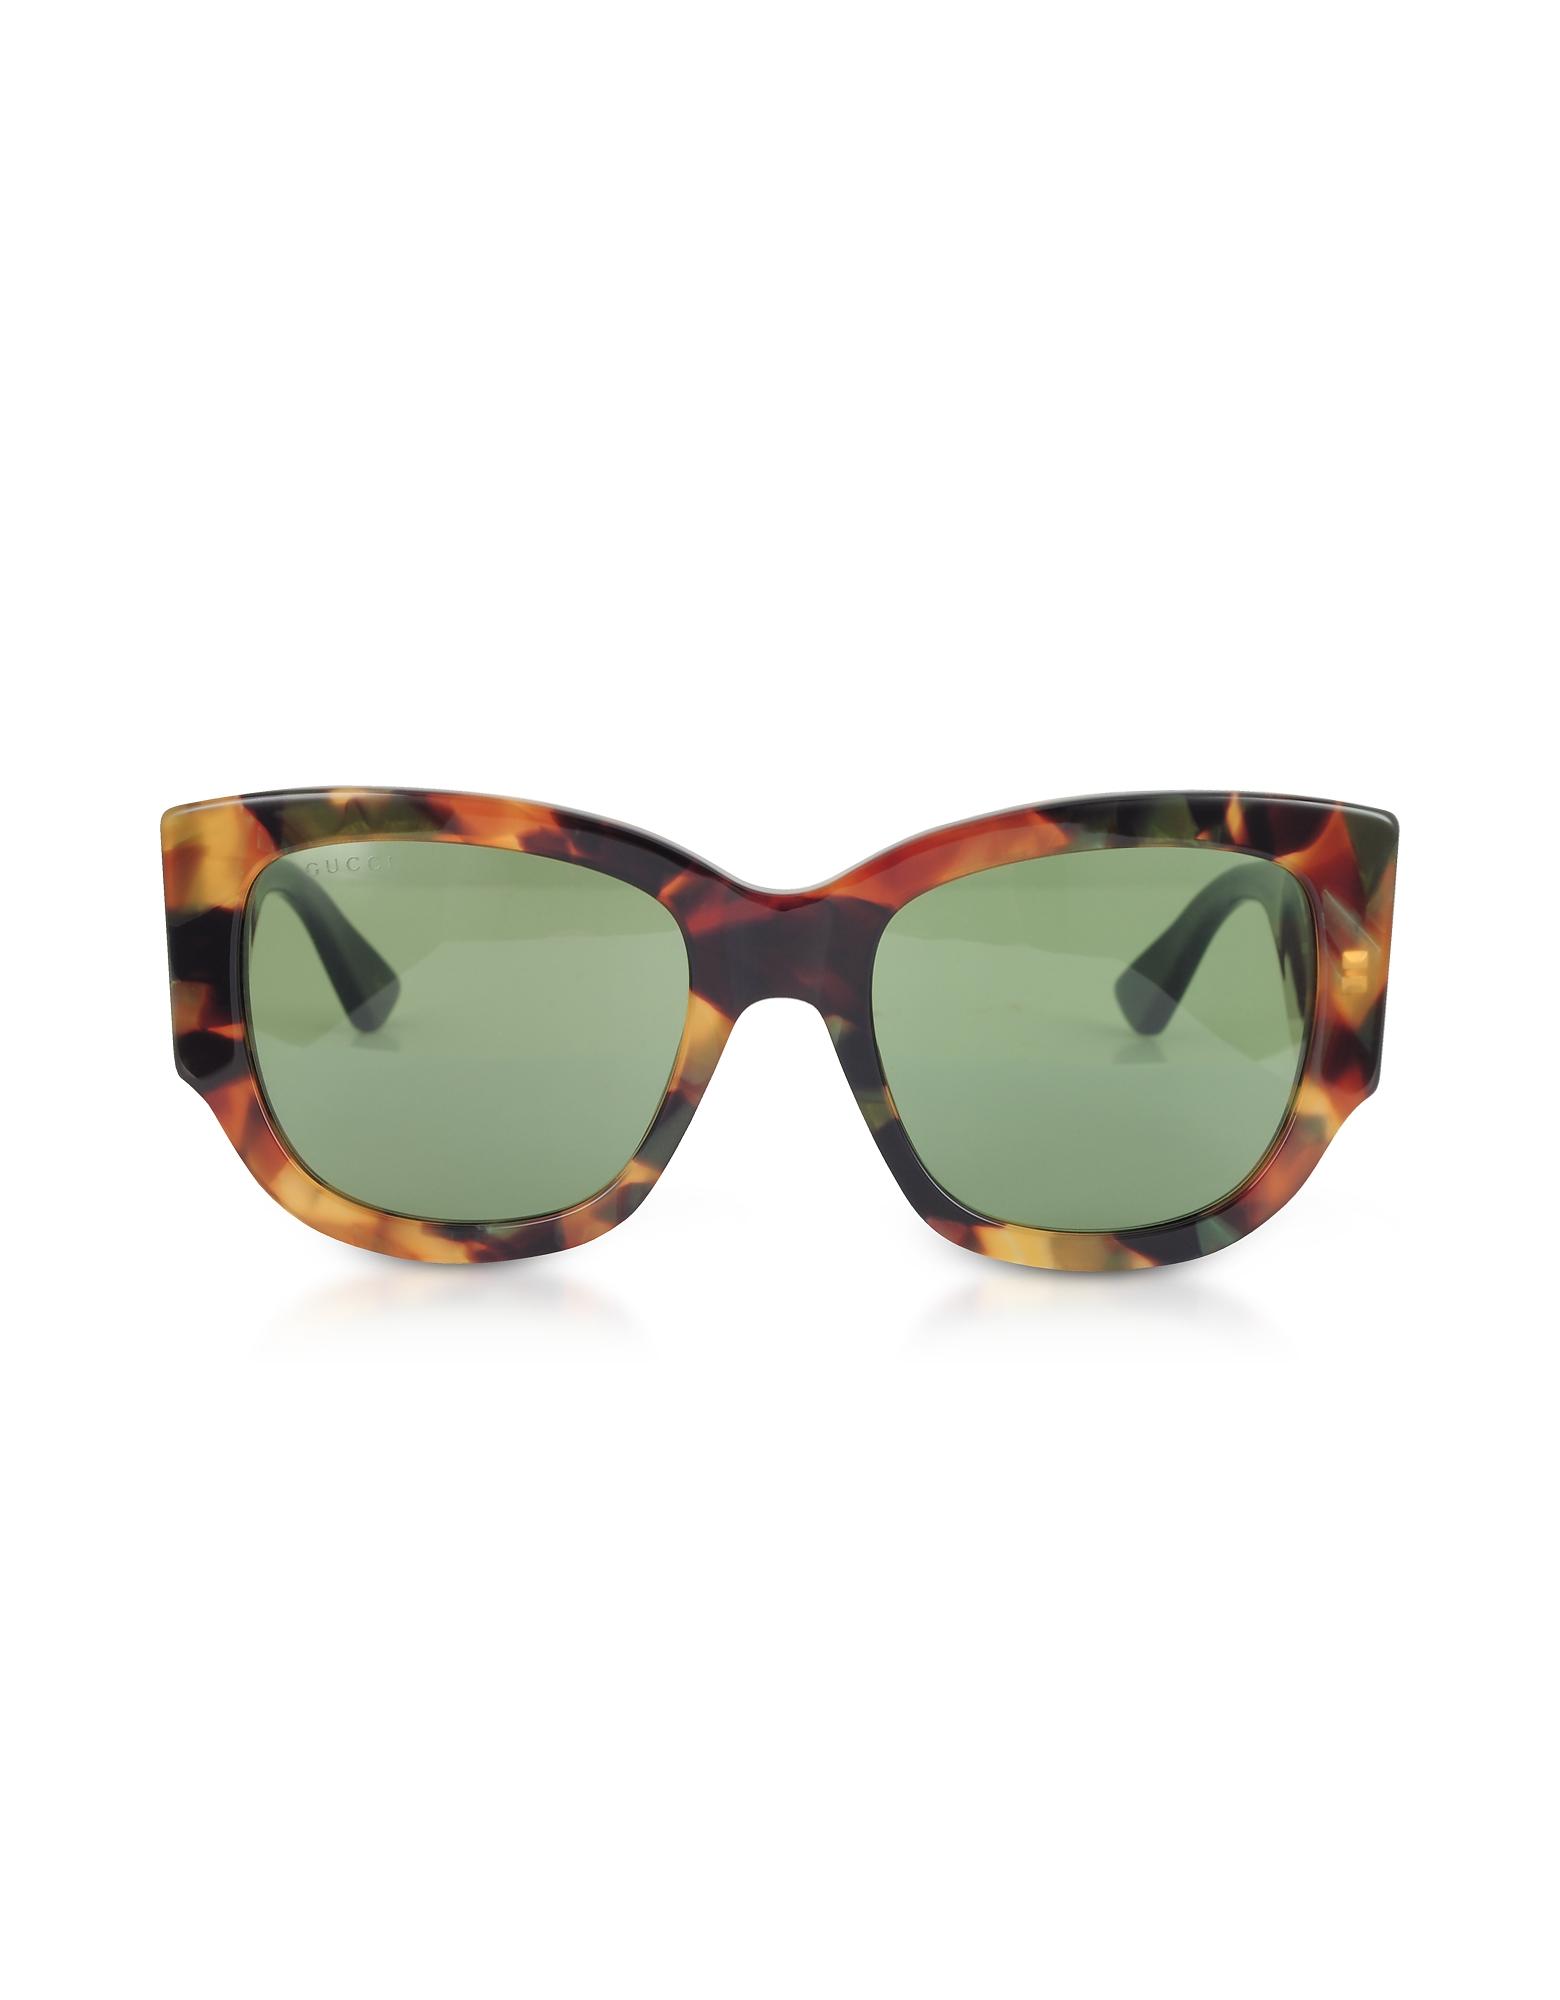 Gucci Designer Sunglasses, GG0276S Dark Tortoiseshell Oversize Cat Eye Acetate Sunglasses w/Sylvie Web Temples